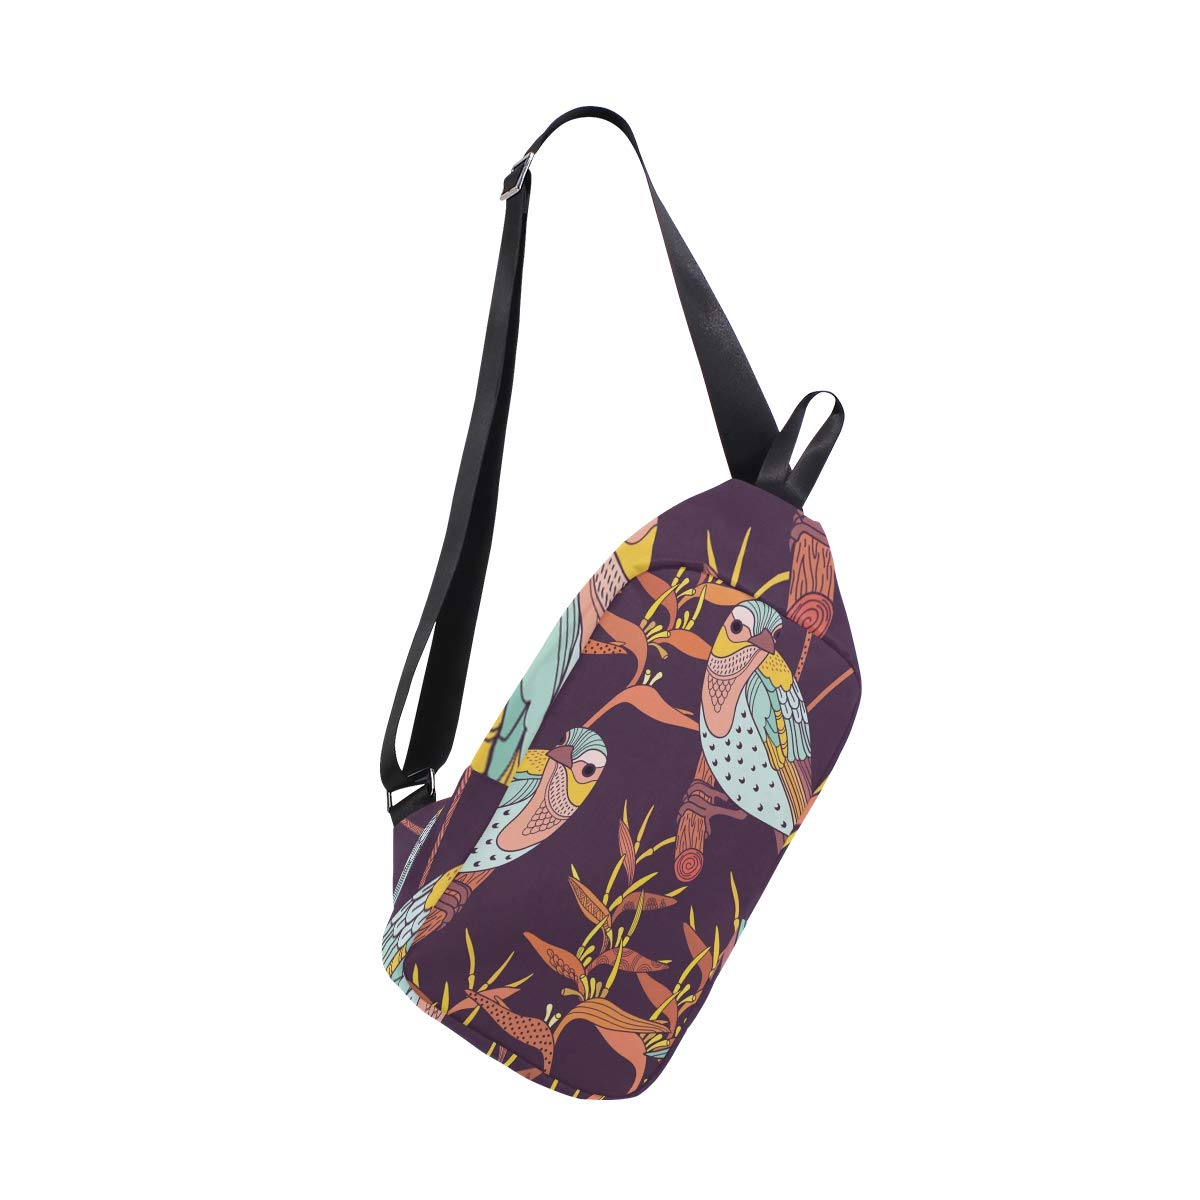 TFONE Bird Pattern Crossbody Bag Lightweight Chest Shoulder Messenger Pack Backpack Sling Bag